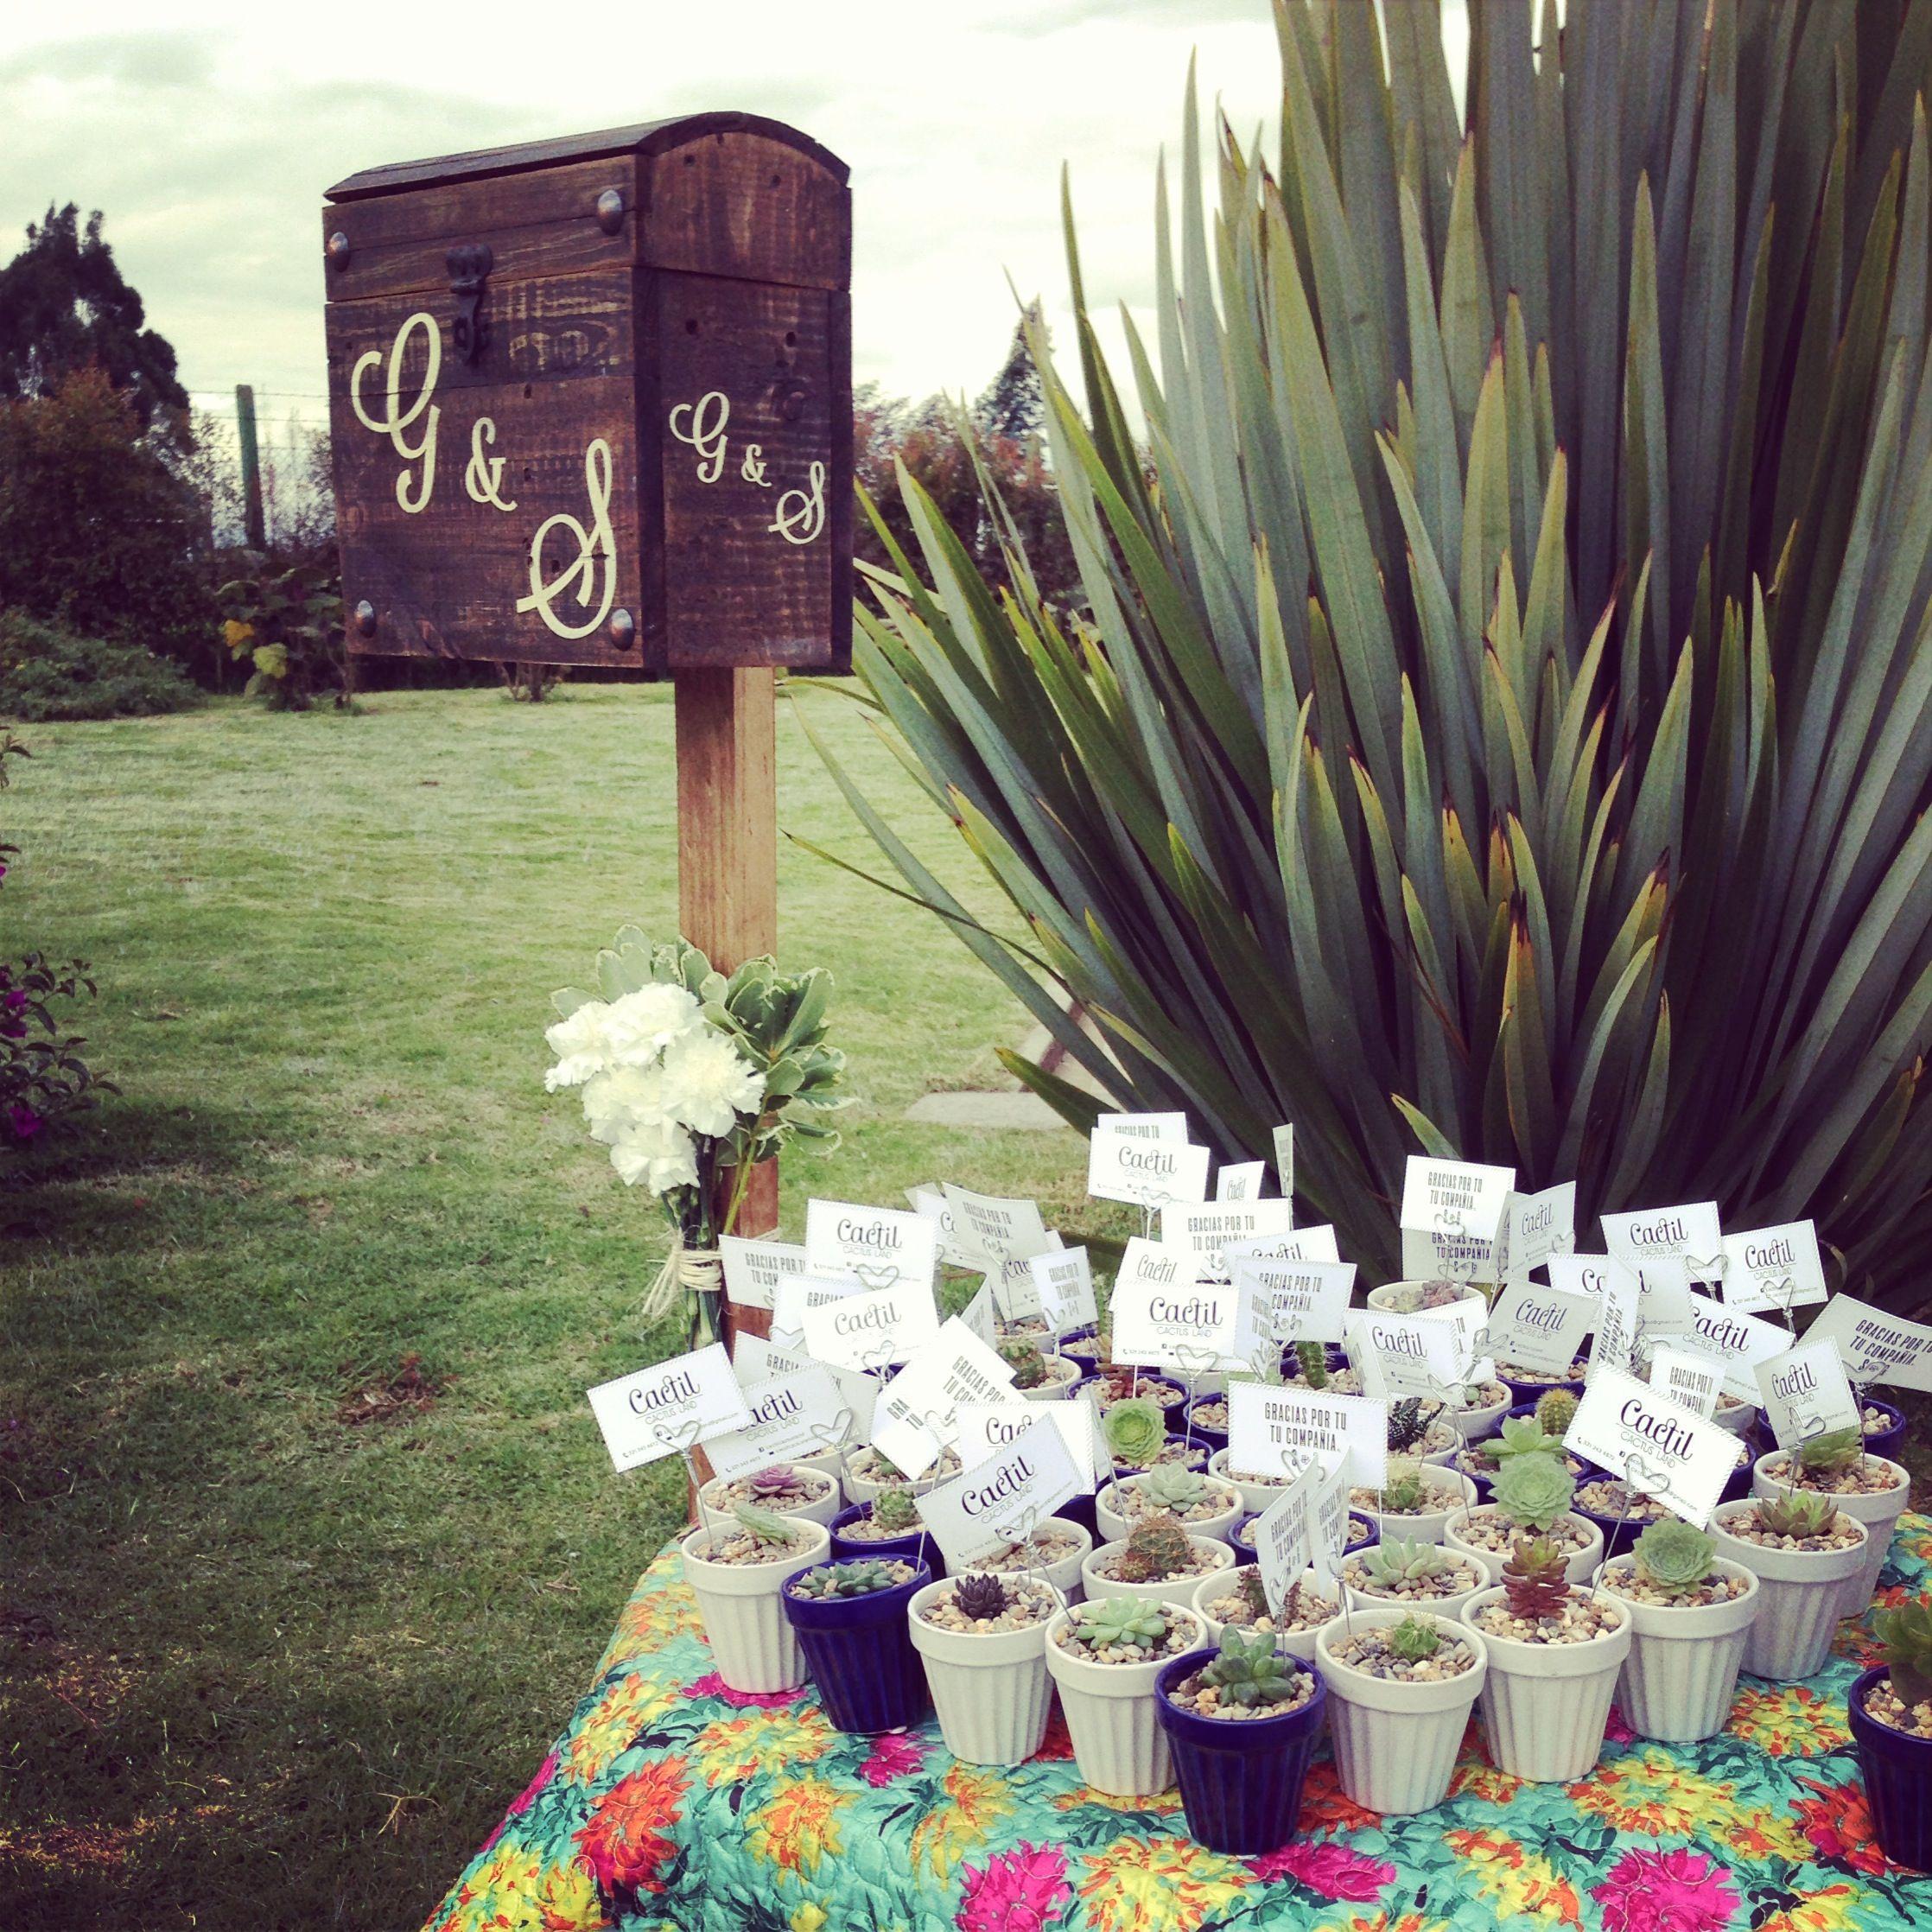 Decoración de matrimonio, wedding decoration by Cactil Cactus Land